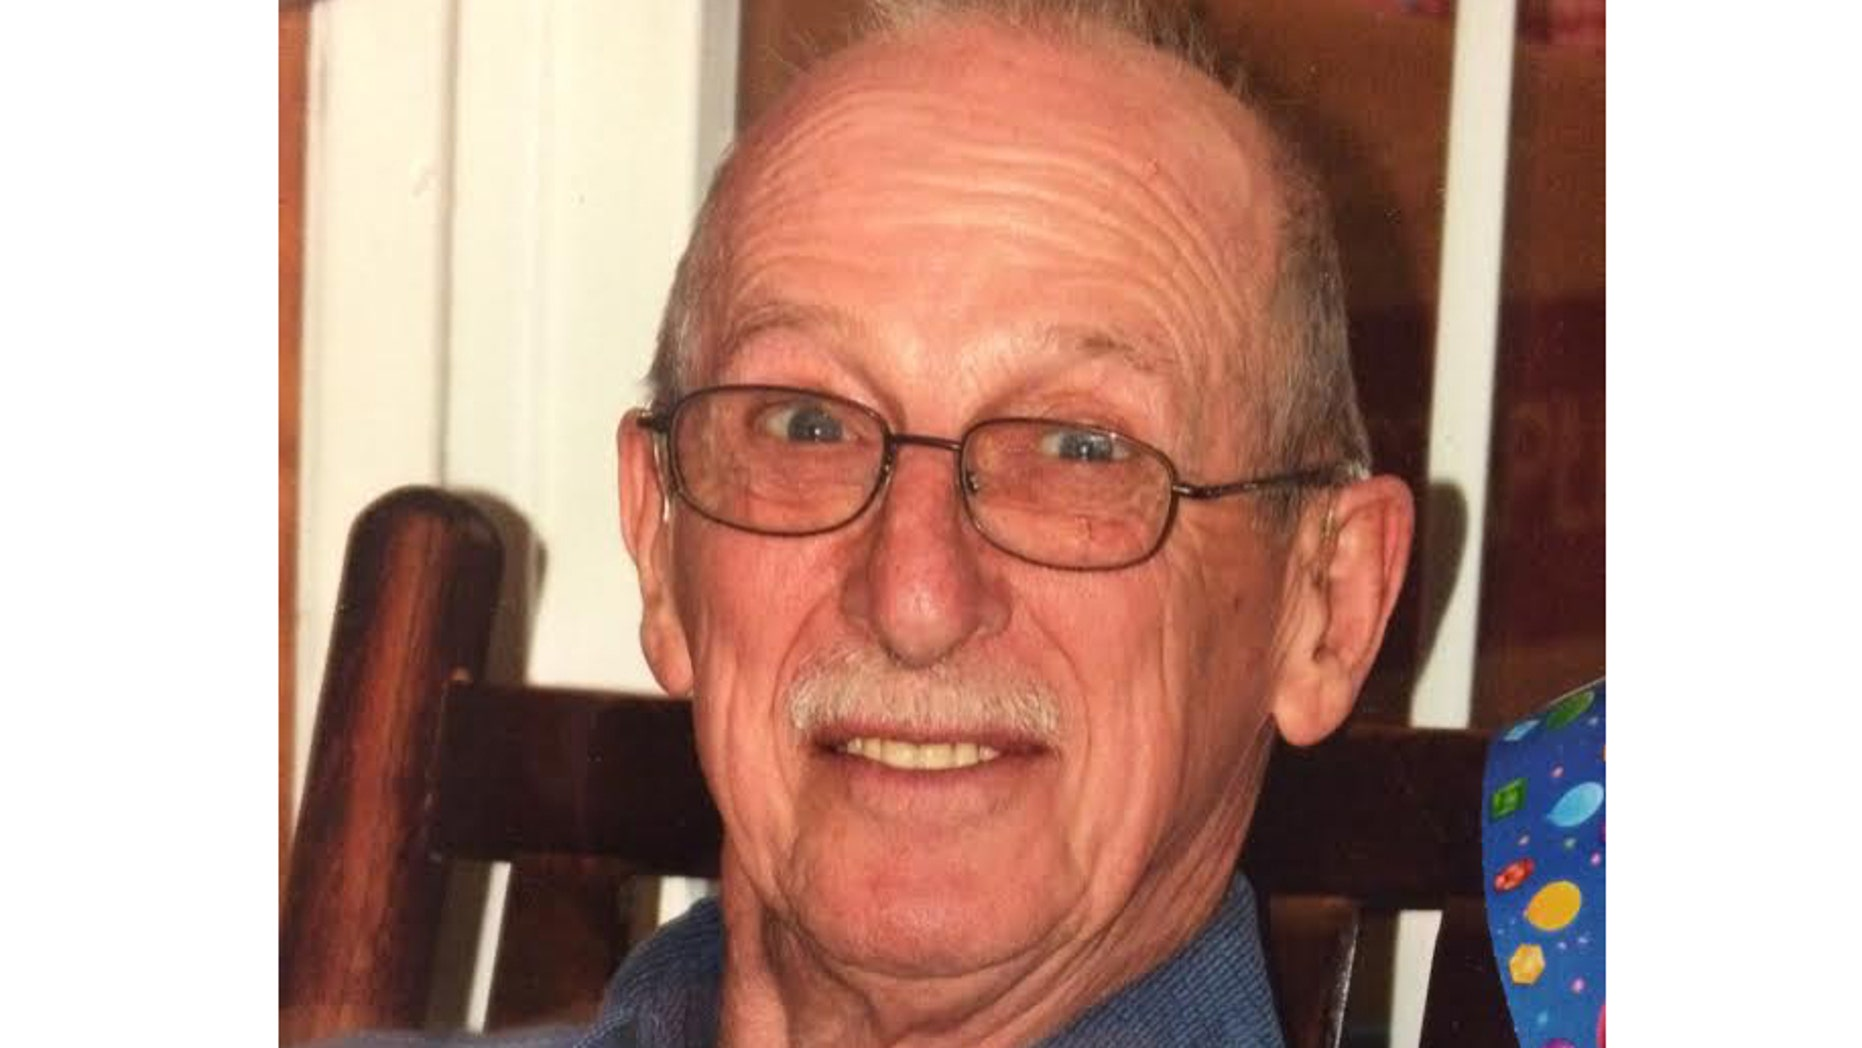 William Smith, 80, of Sturbridge, Mass.